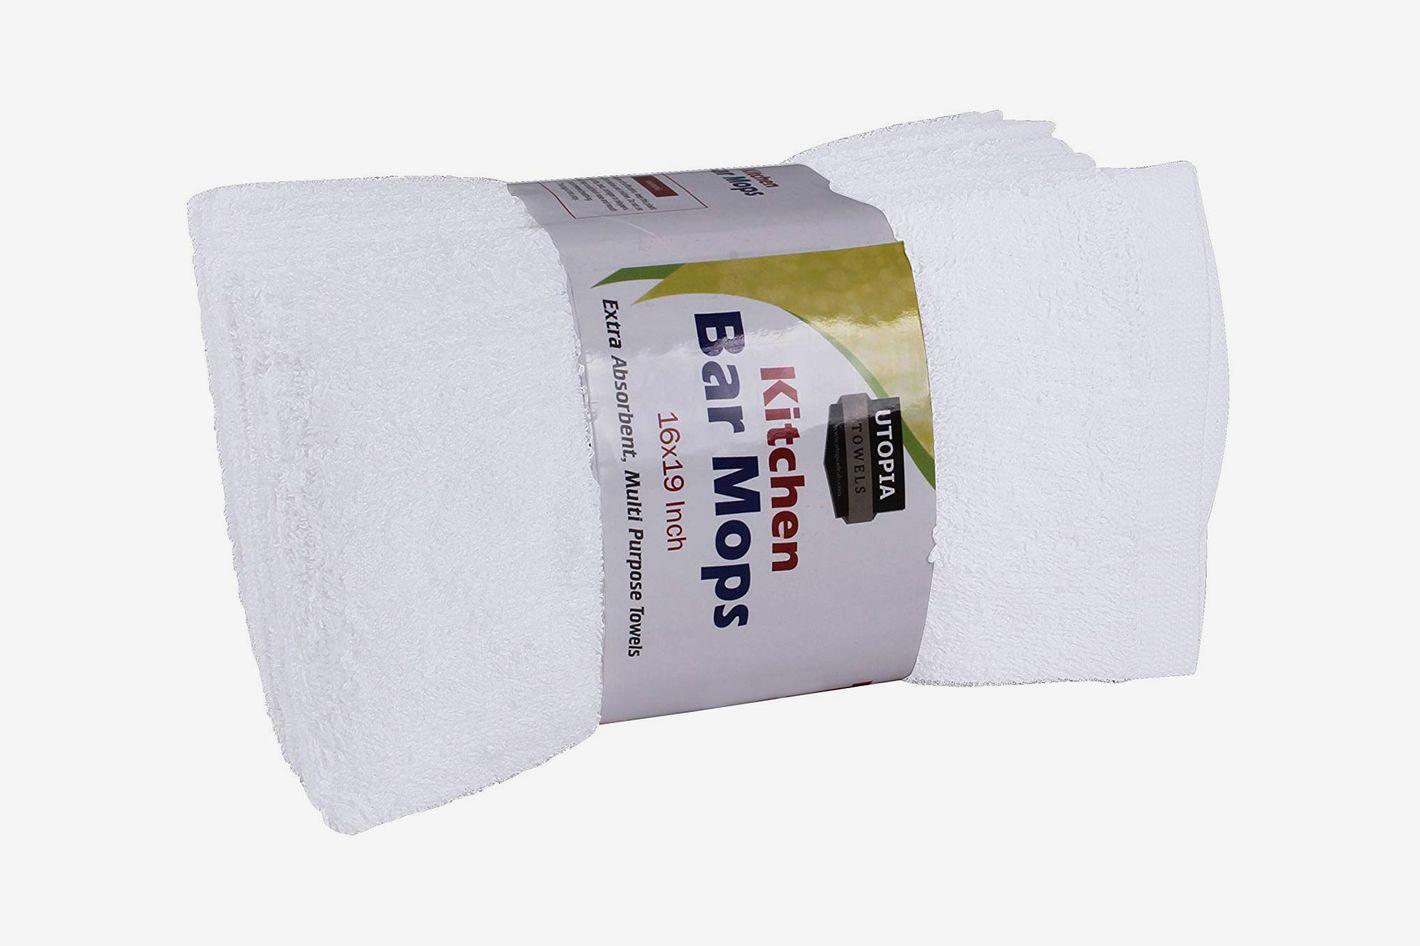 Utopia Towels Kitchen Bar Mop Cleaning Towels